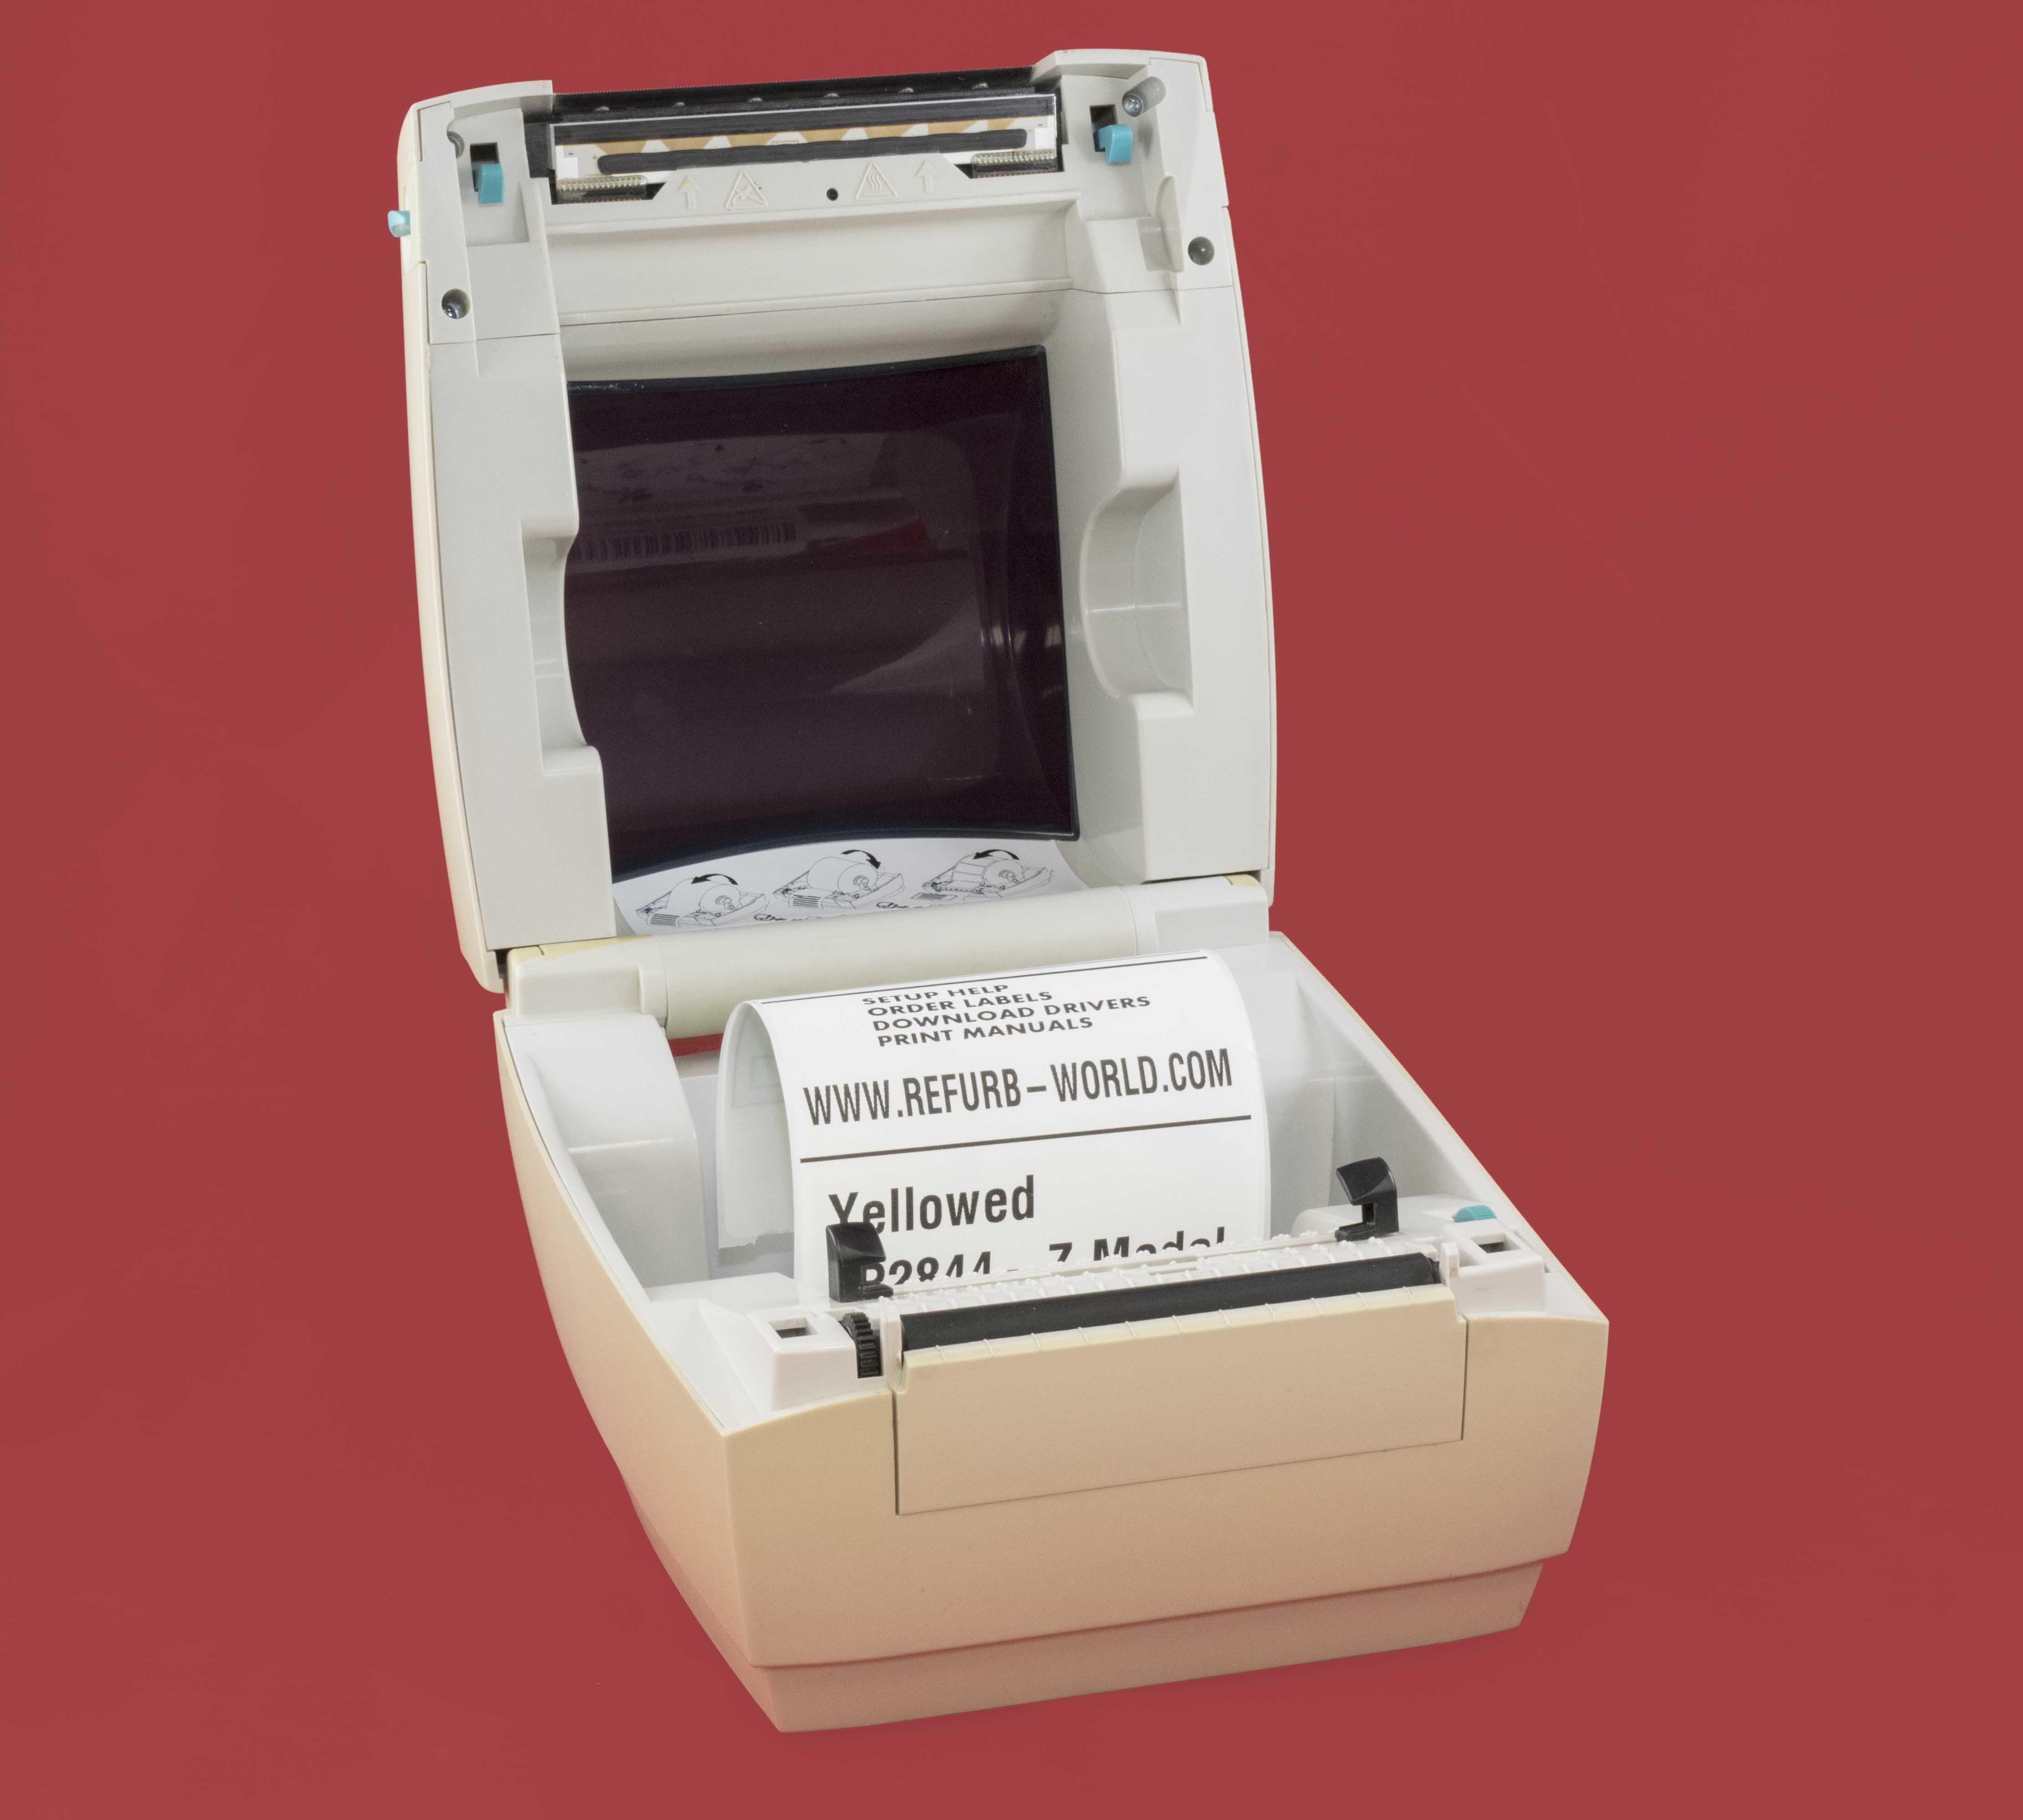 Zebra Yellowed LP 2844 Direct Thermal Label Tag Printer $119 99